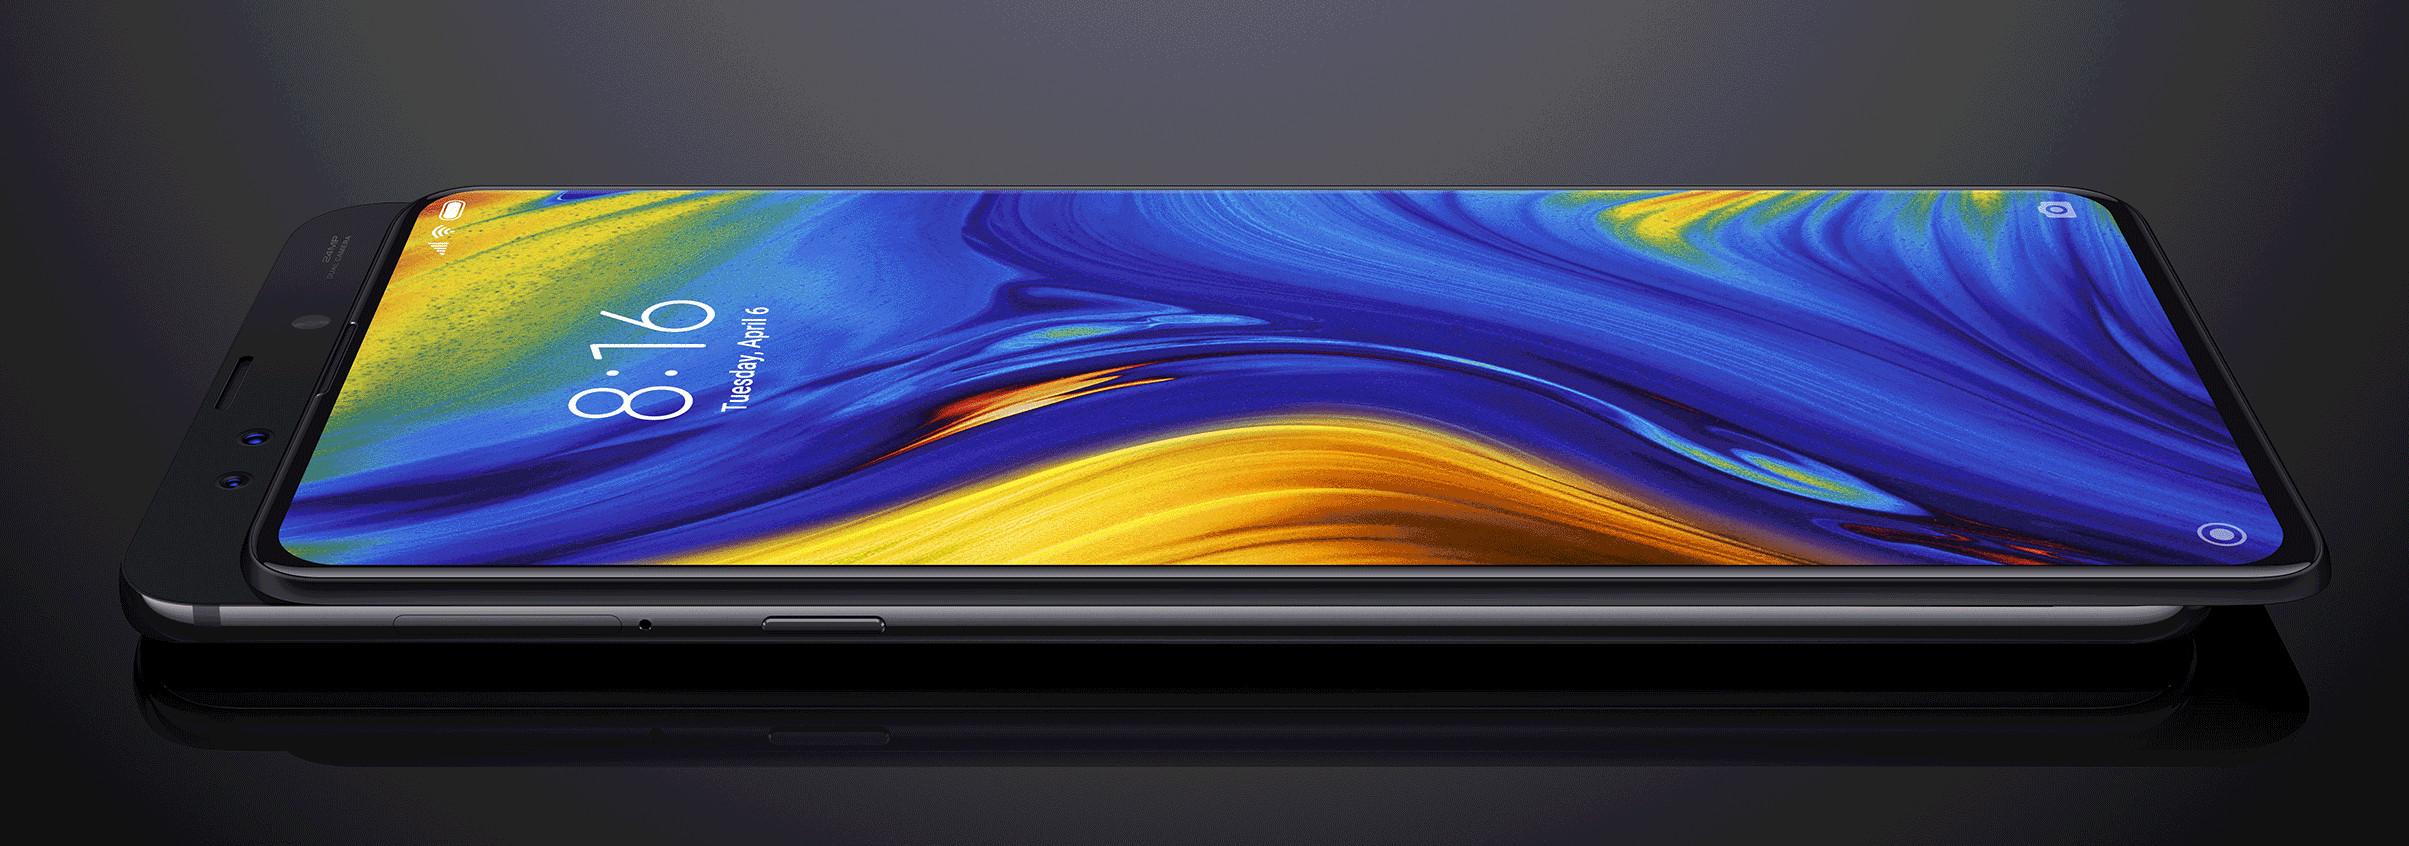 Smartphone Xiaomi Mi Mix 3 - The ultimate 2020 Review - Screen - Best price in UAE - Darahim.net